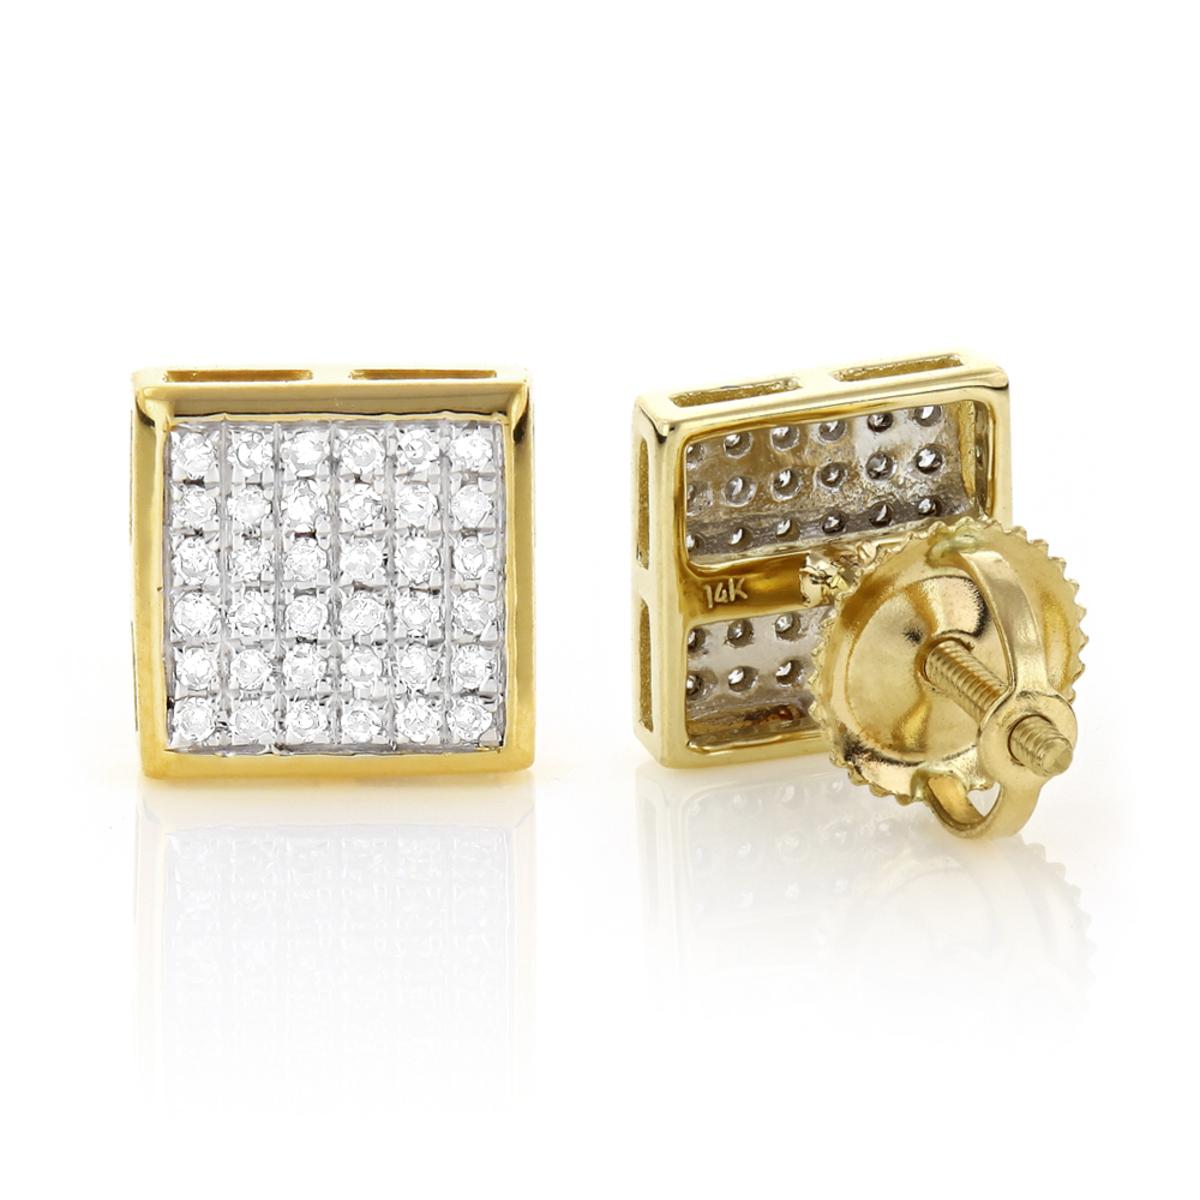 14K Gold Square Shaped Diamond Stud Earrings 0.41ct